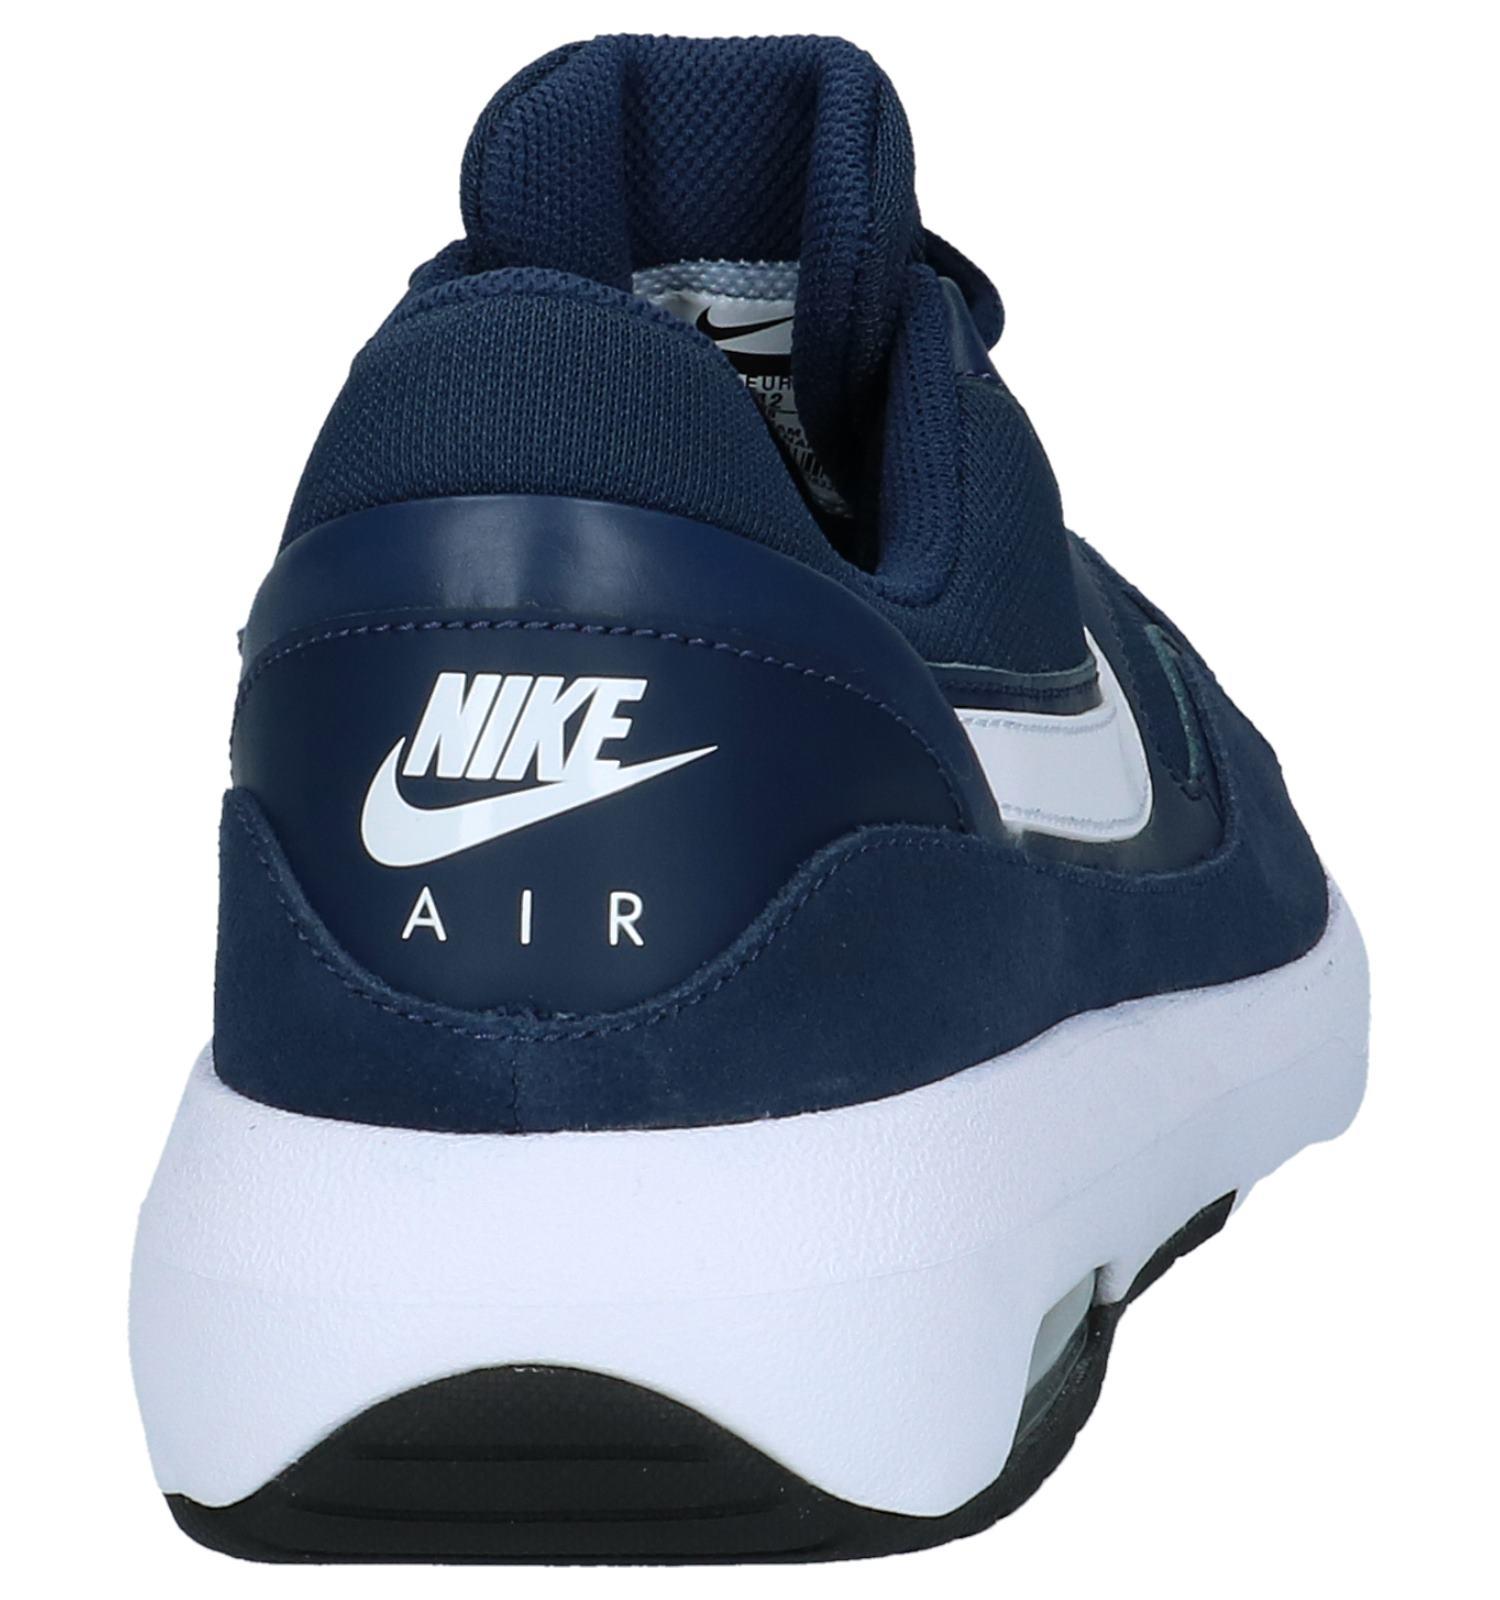 Nike En be Max Donker Gratis Sneakers Nostalgic Verzend Air Torfs Blauwe Retour qw1O57xS